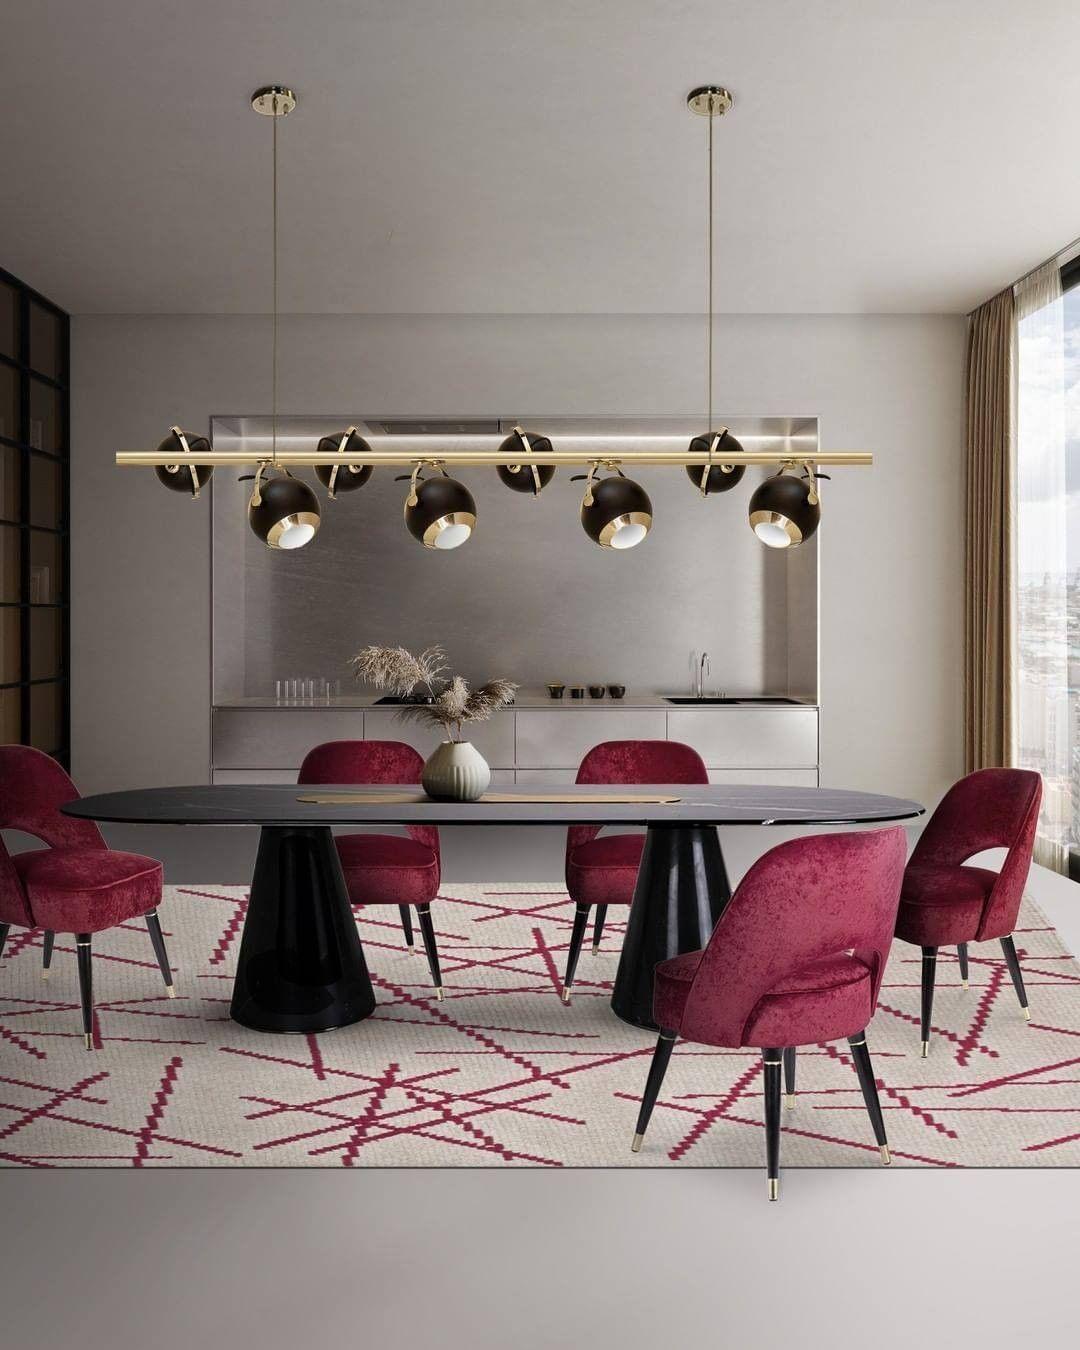 Dining Room Ideas On Instagram   Vintage dining room, Dining room ...